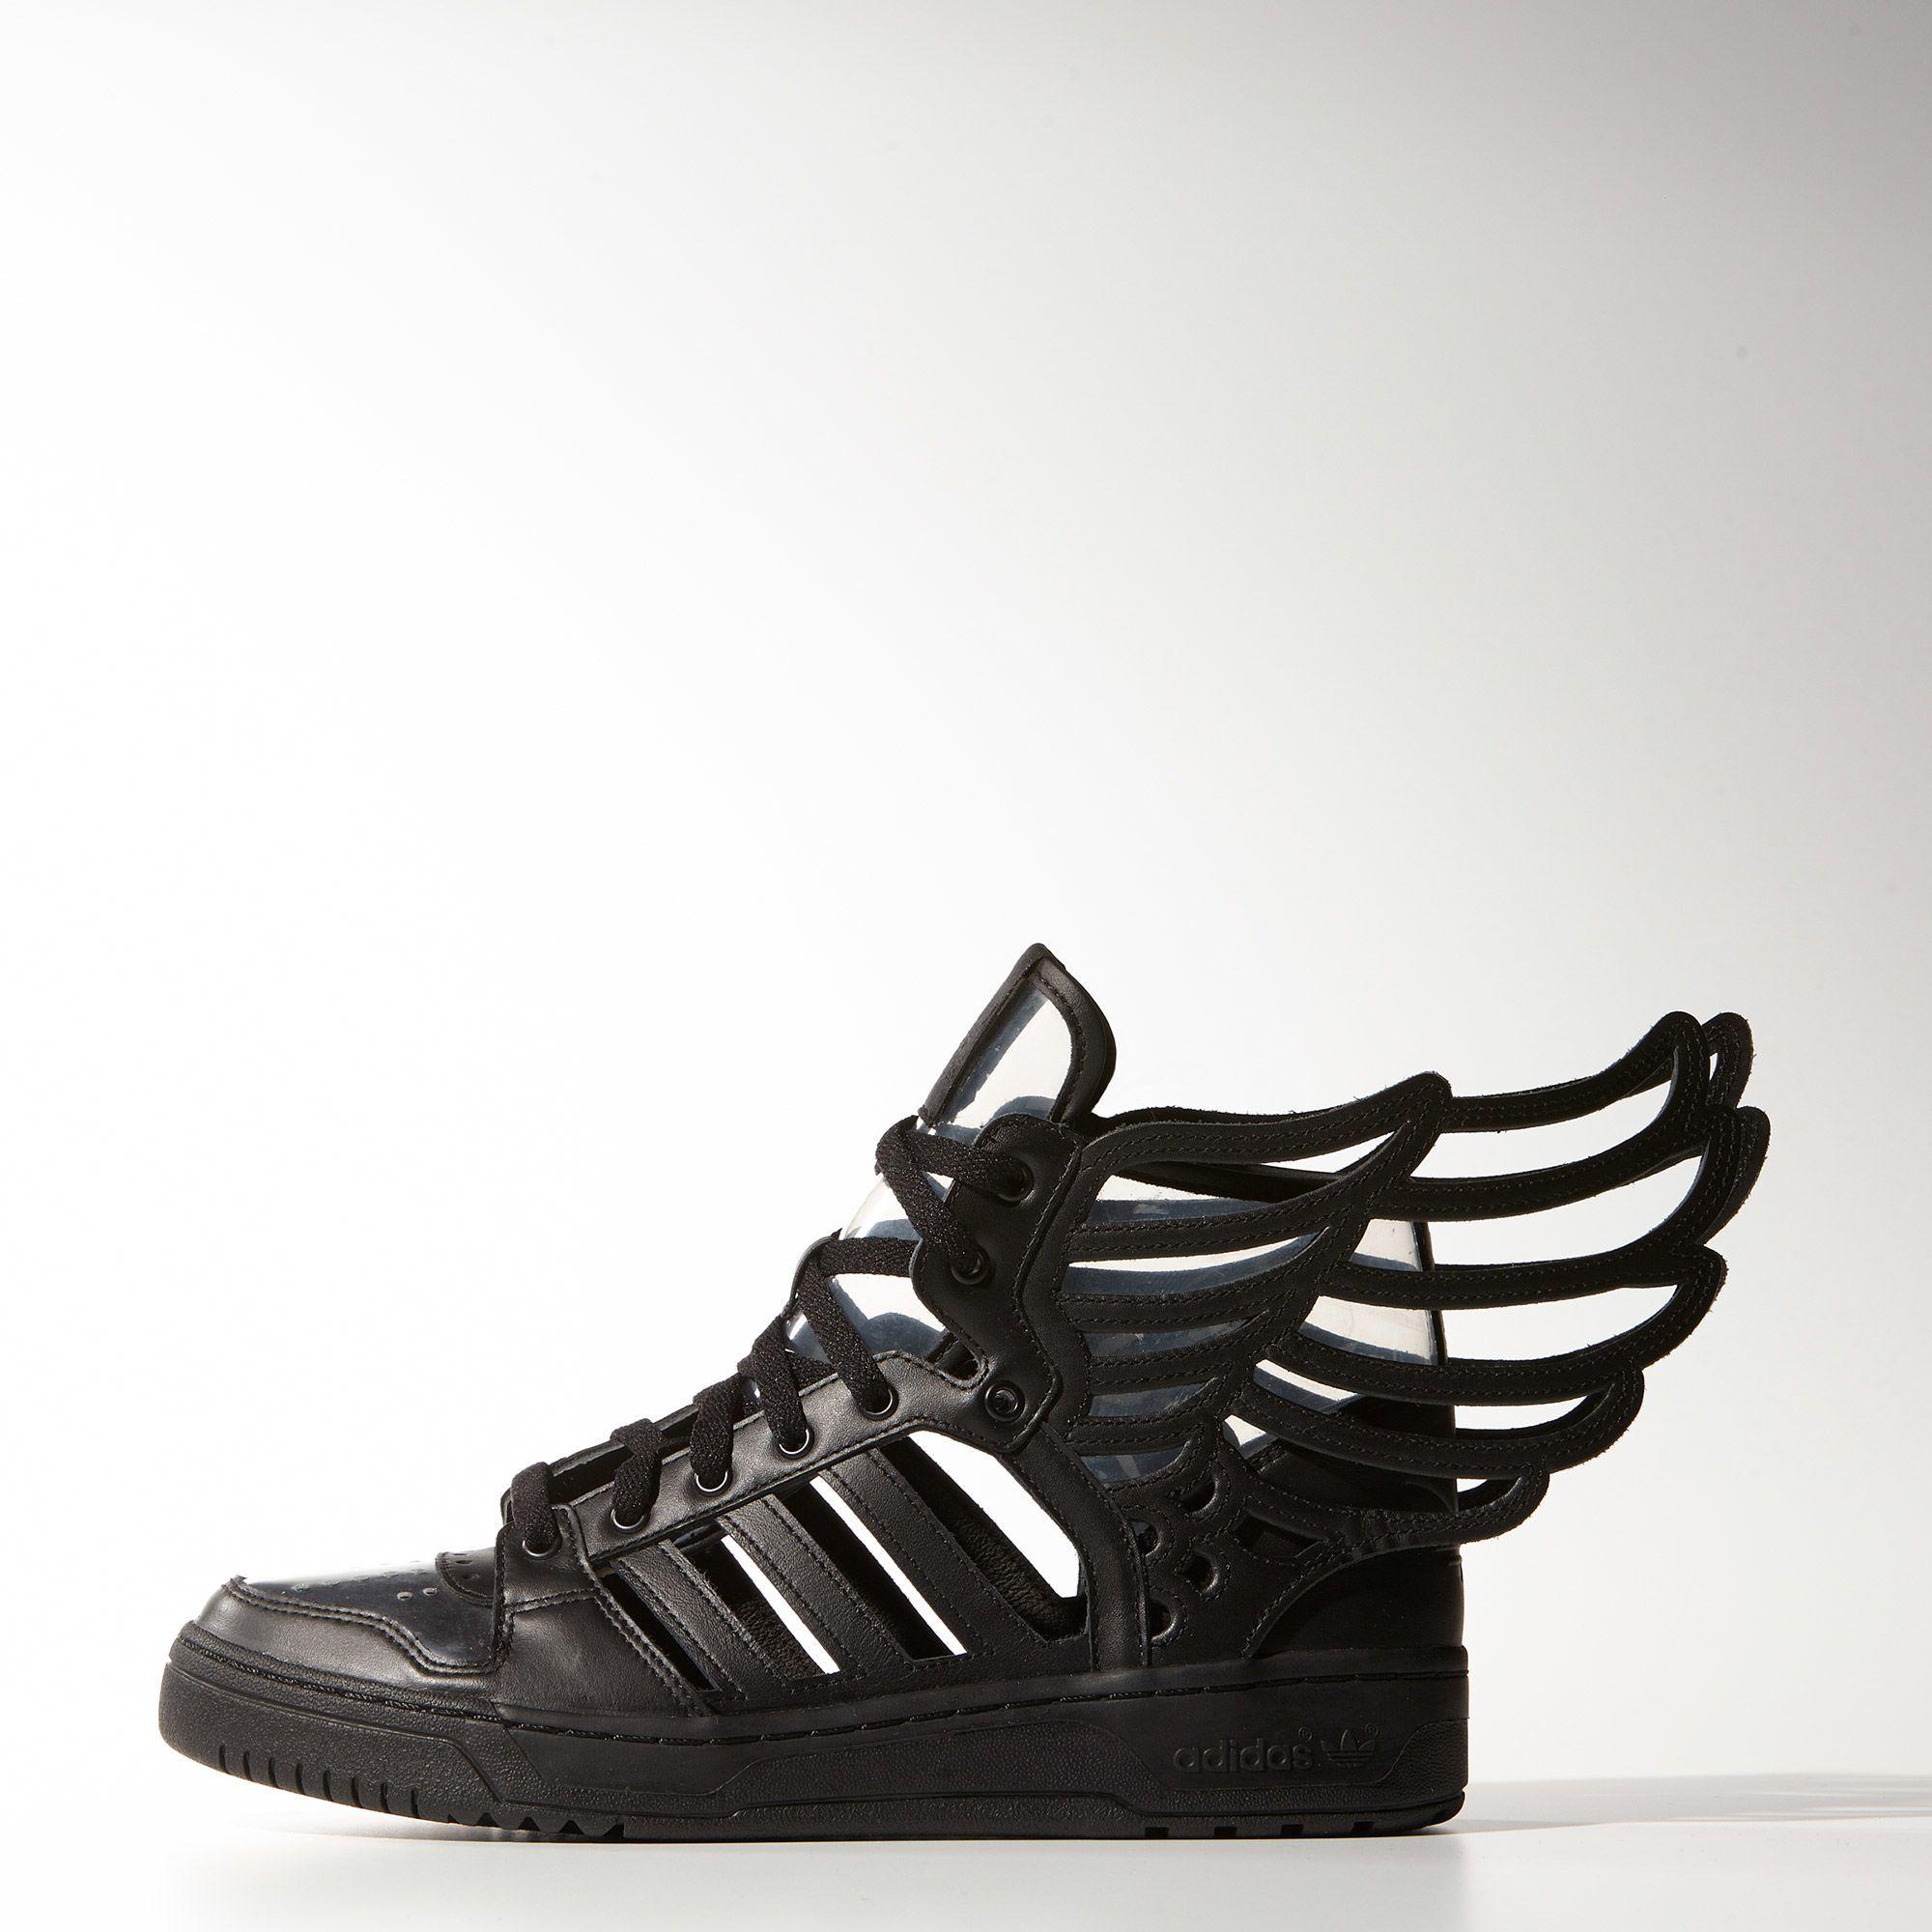 adidas Jeremy Scott Wings 2.0 Shoes (com imagens